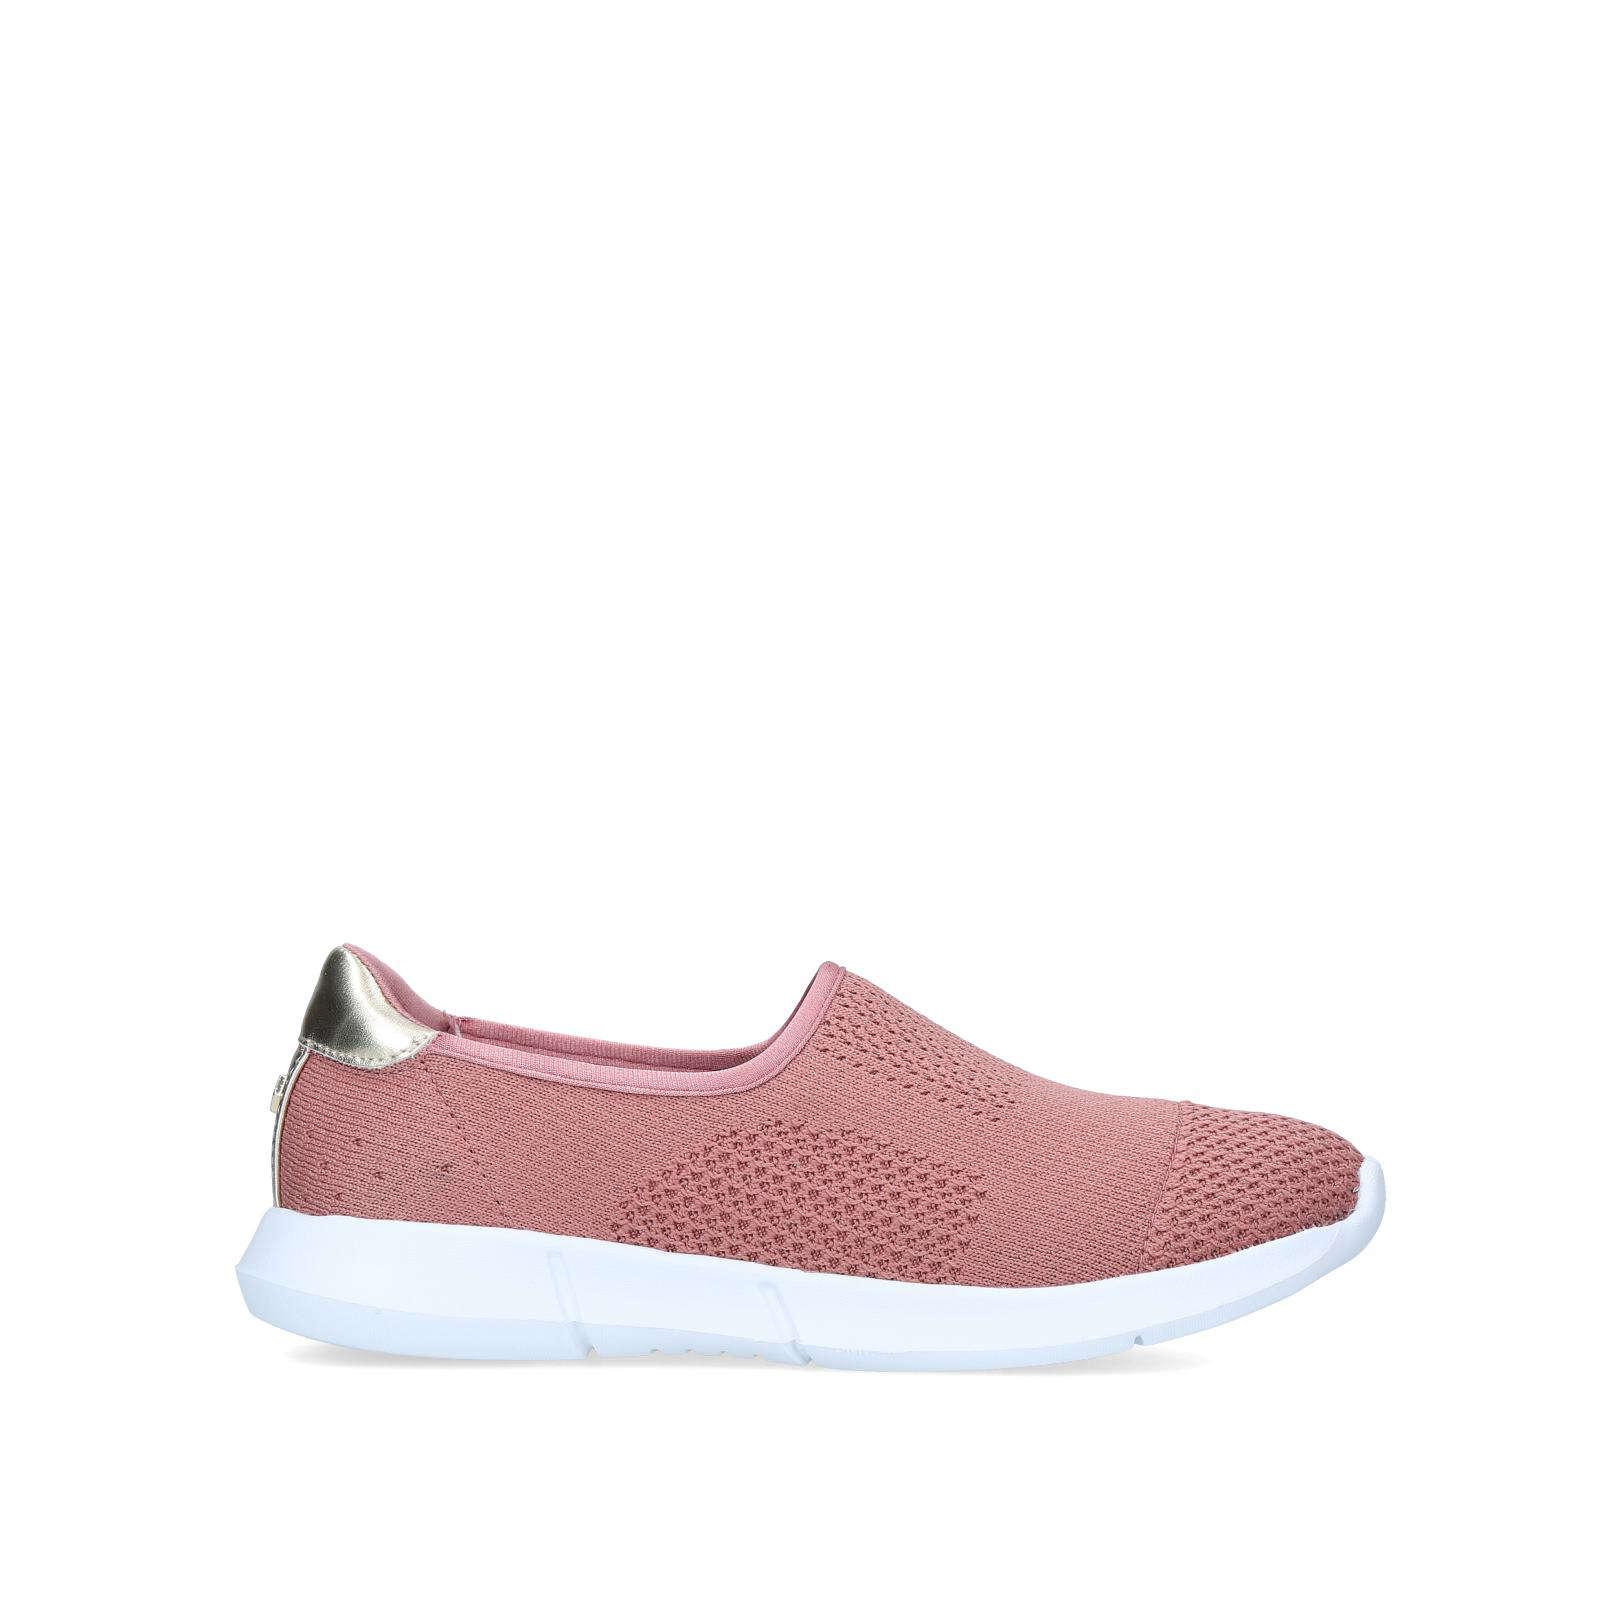 CARLY 2 - CARVELA COMFORT Sneakers